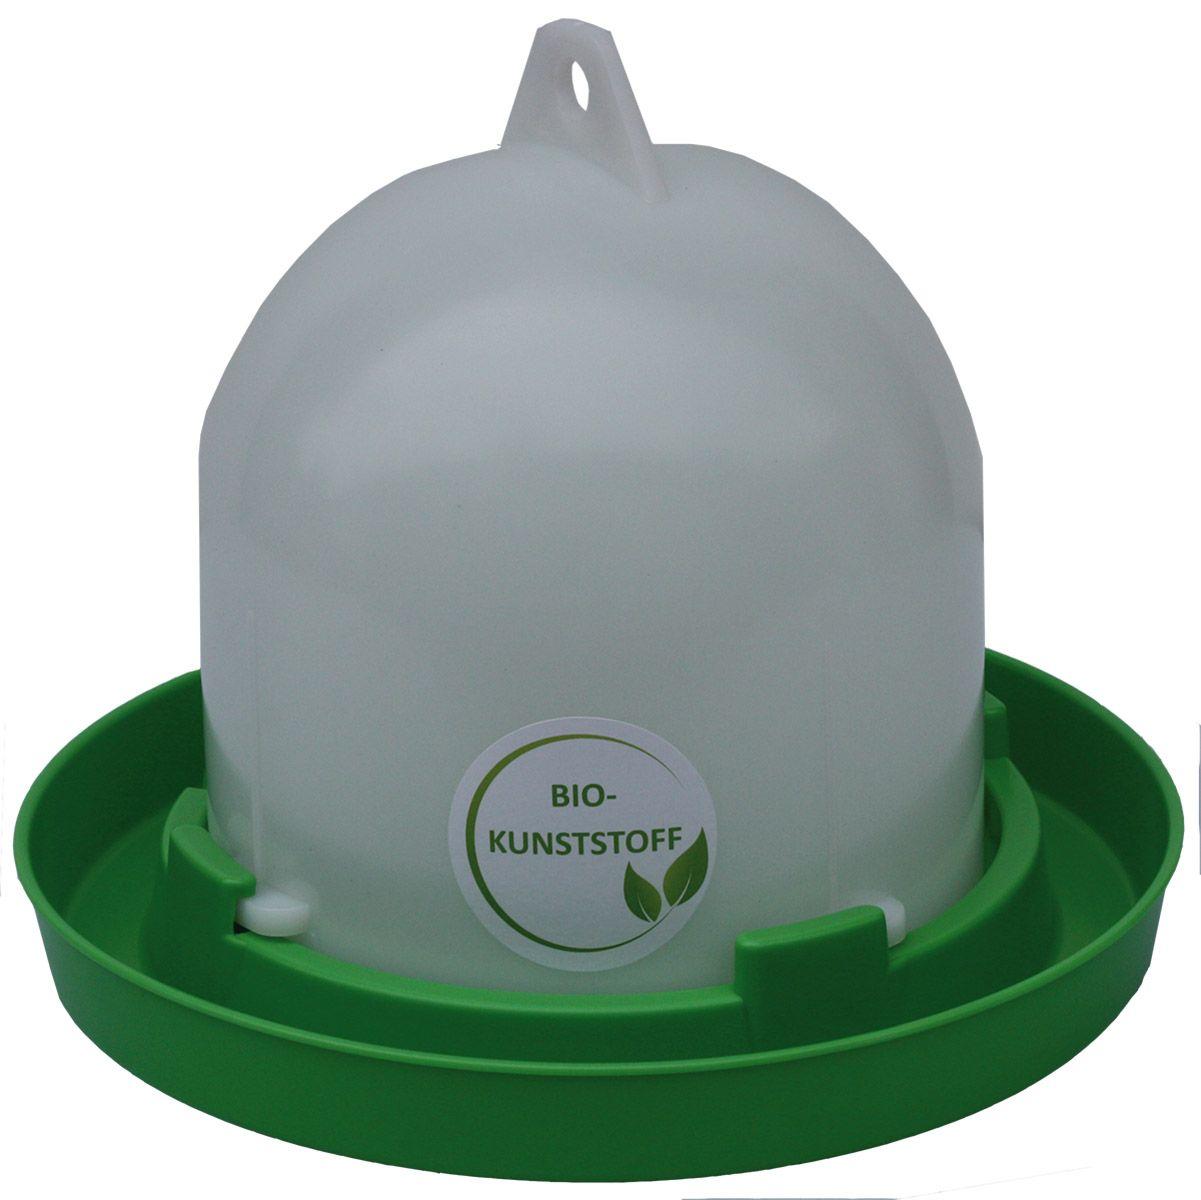 KLAUS - Kükentränke Kunststoff 1 L